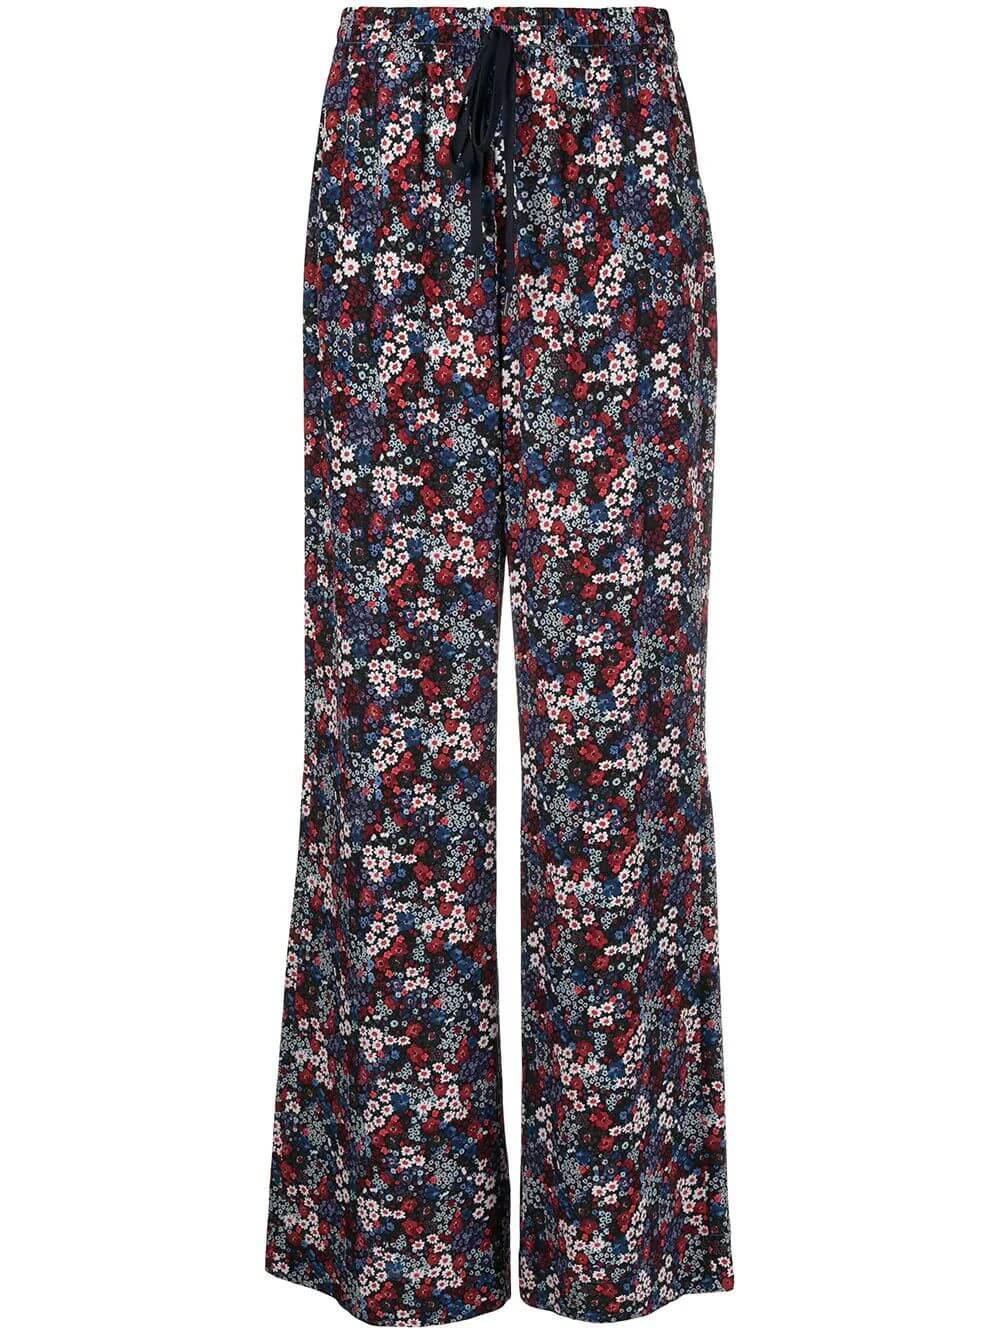 Floral Print Wide Leg Pants